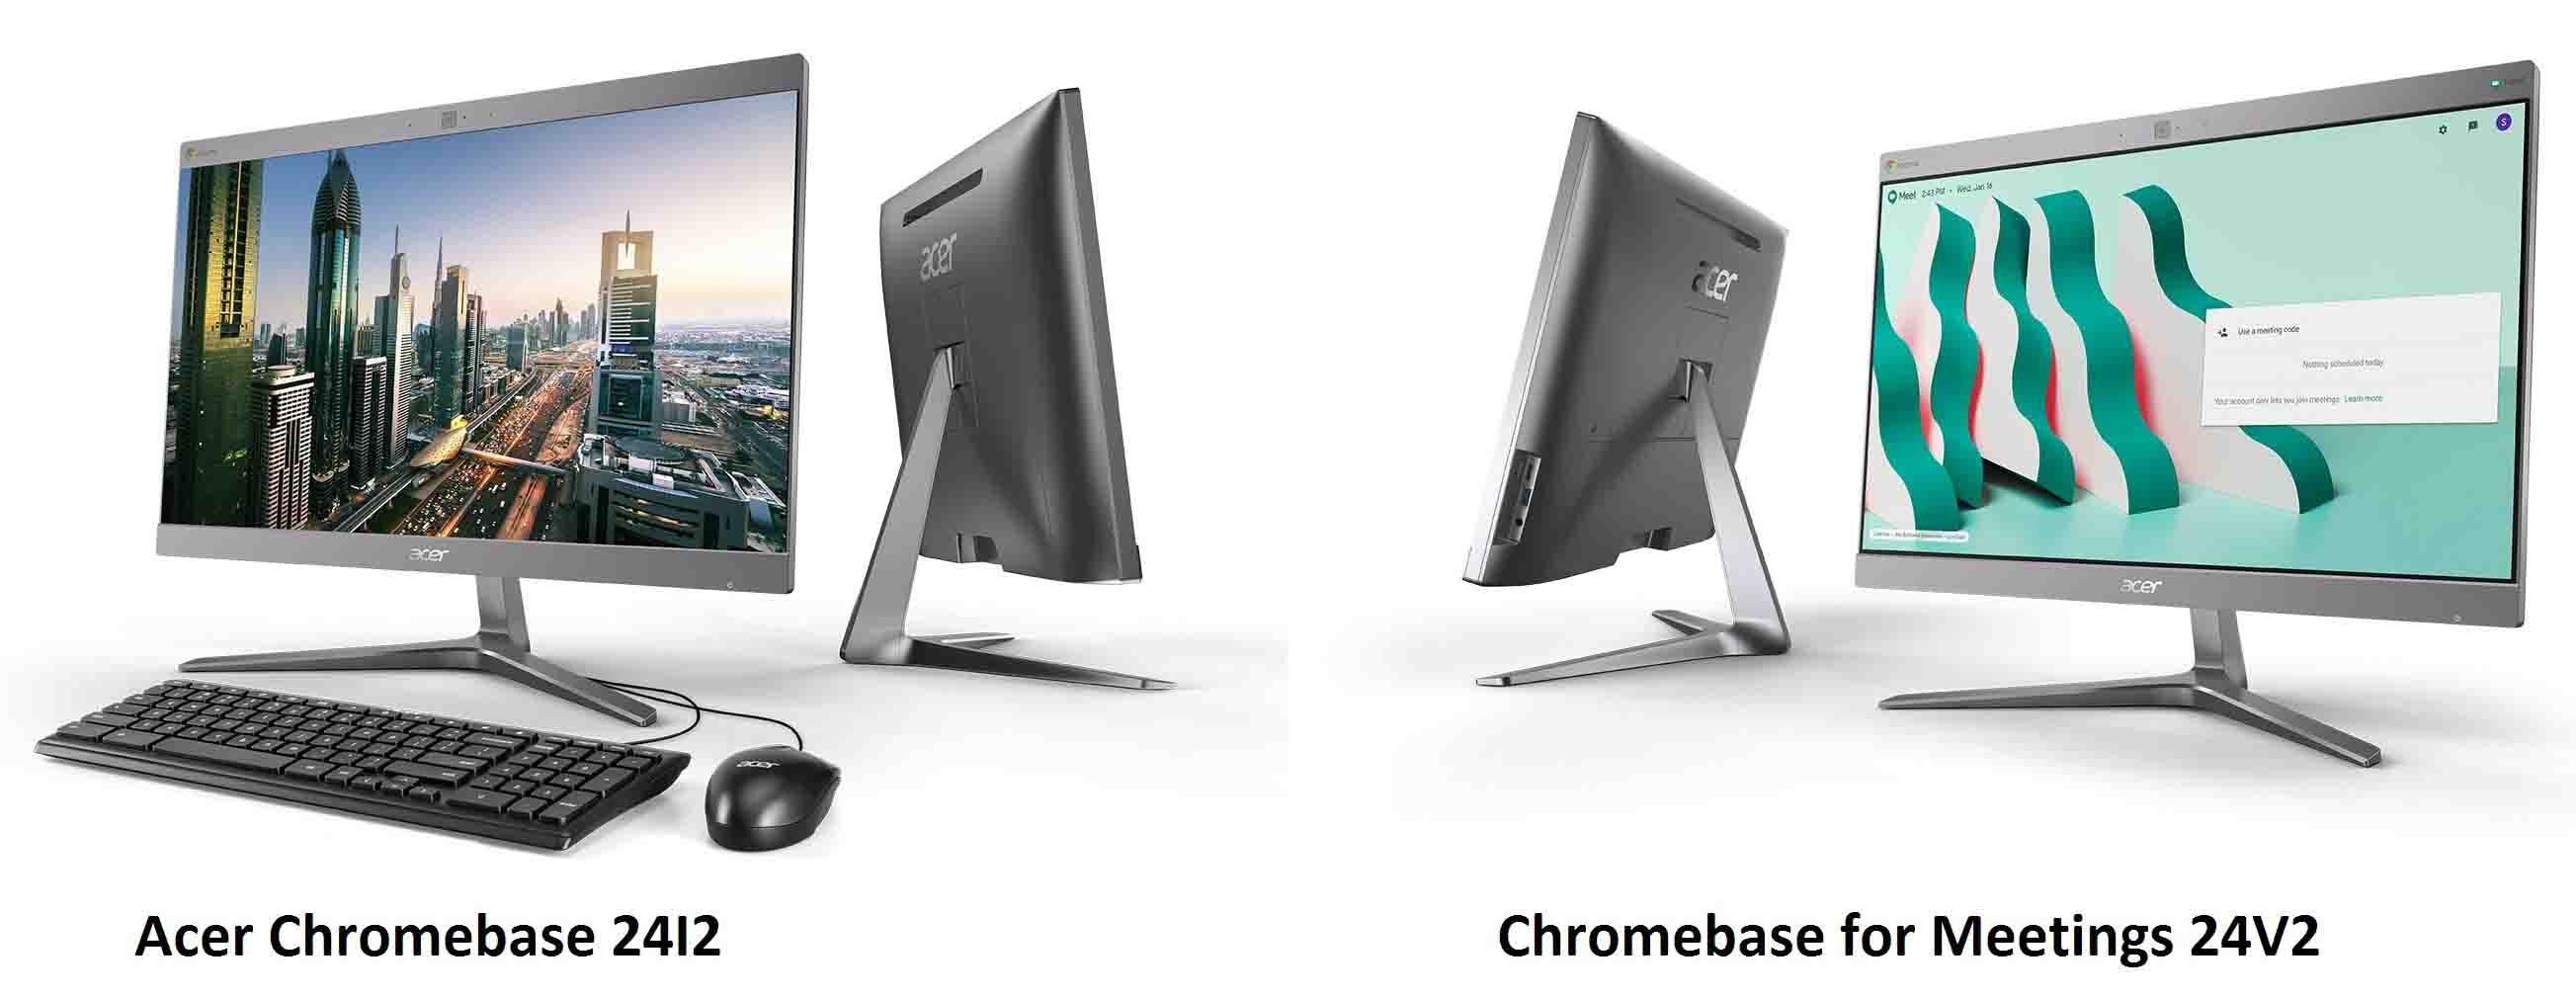 Acer представив два молоблоки на Chrome OS